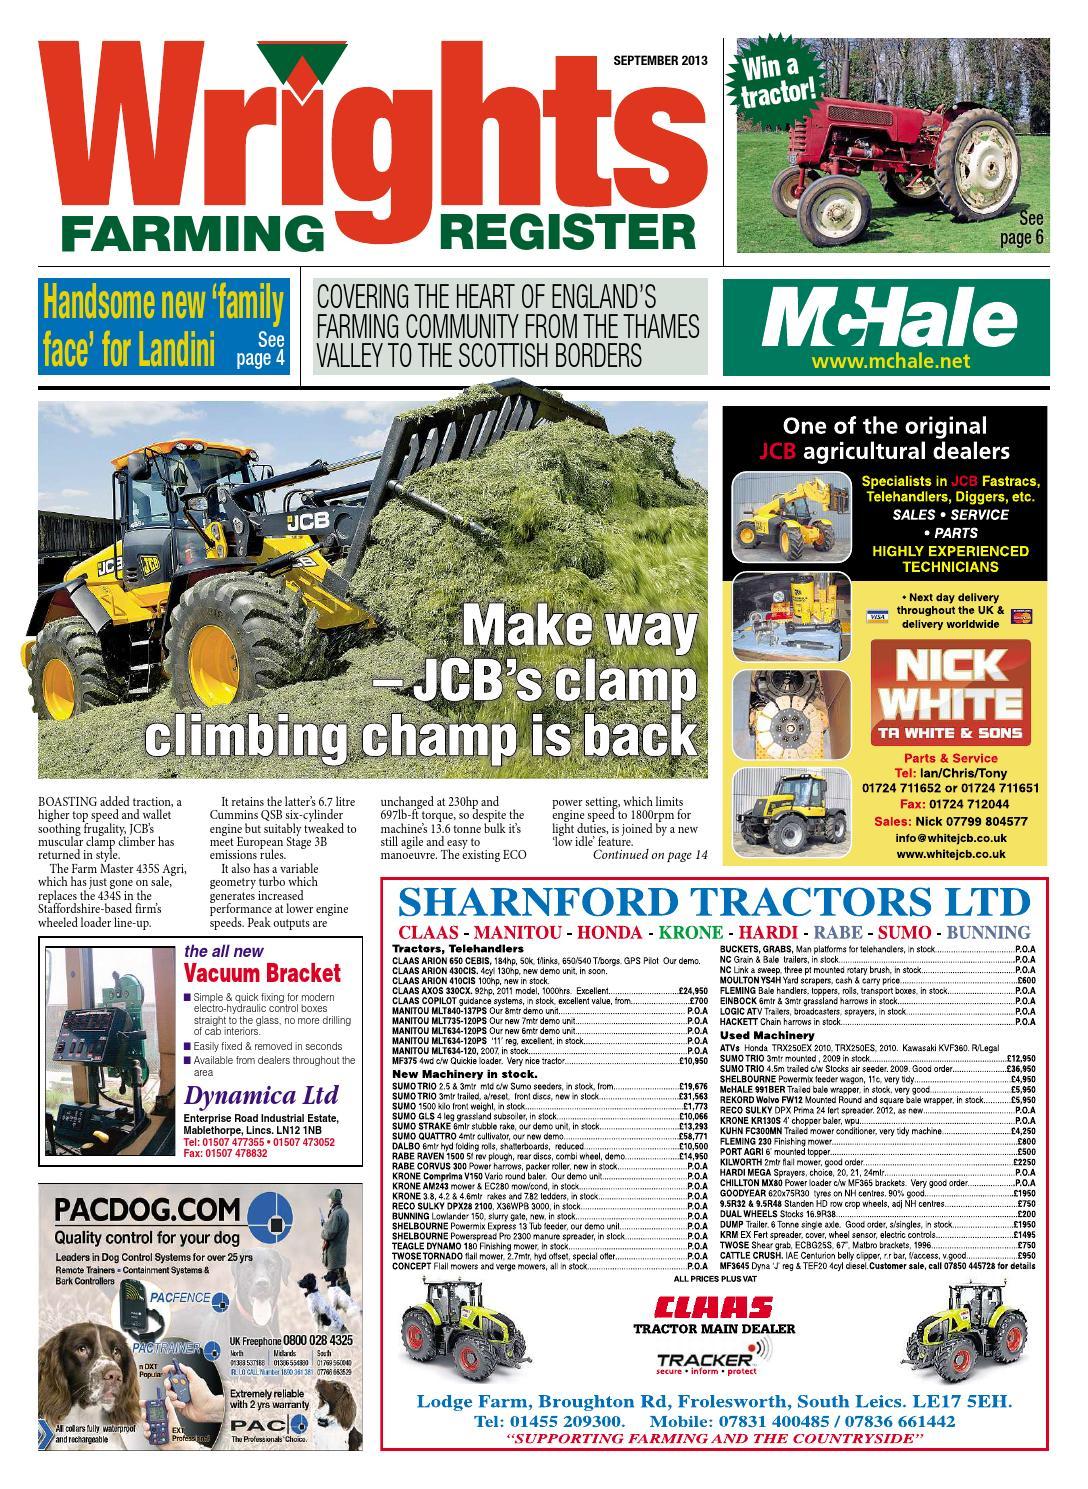 Wrights Farming Register September 2013 Full Edition By Mortons 2006 Nissan Terrano 2 R20 Egr System Wiring Diagram Media Group Ltd Issuu